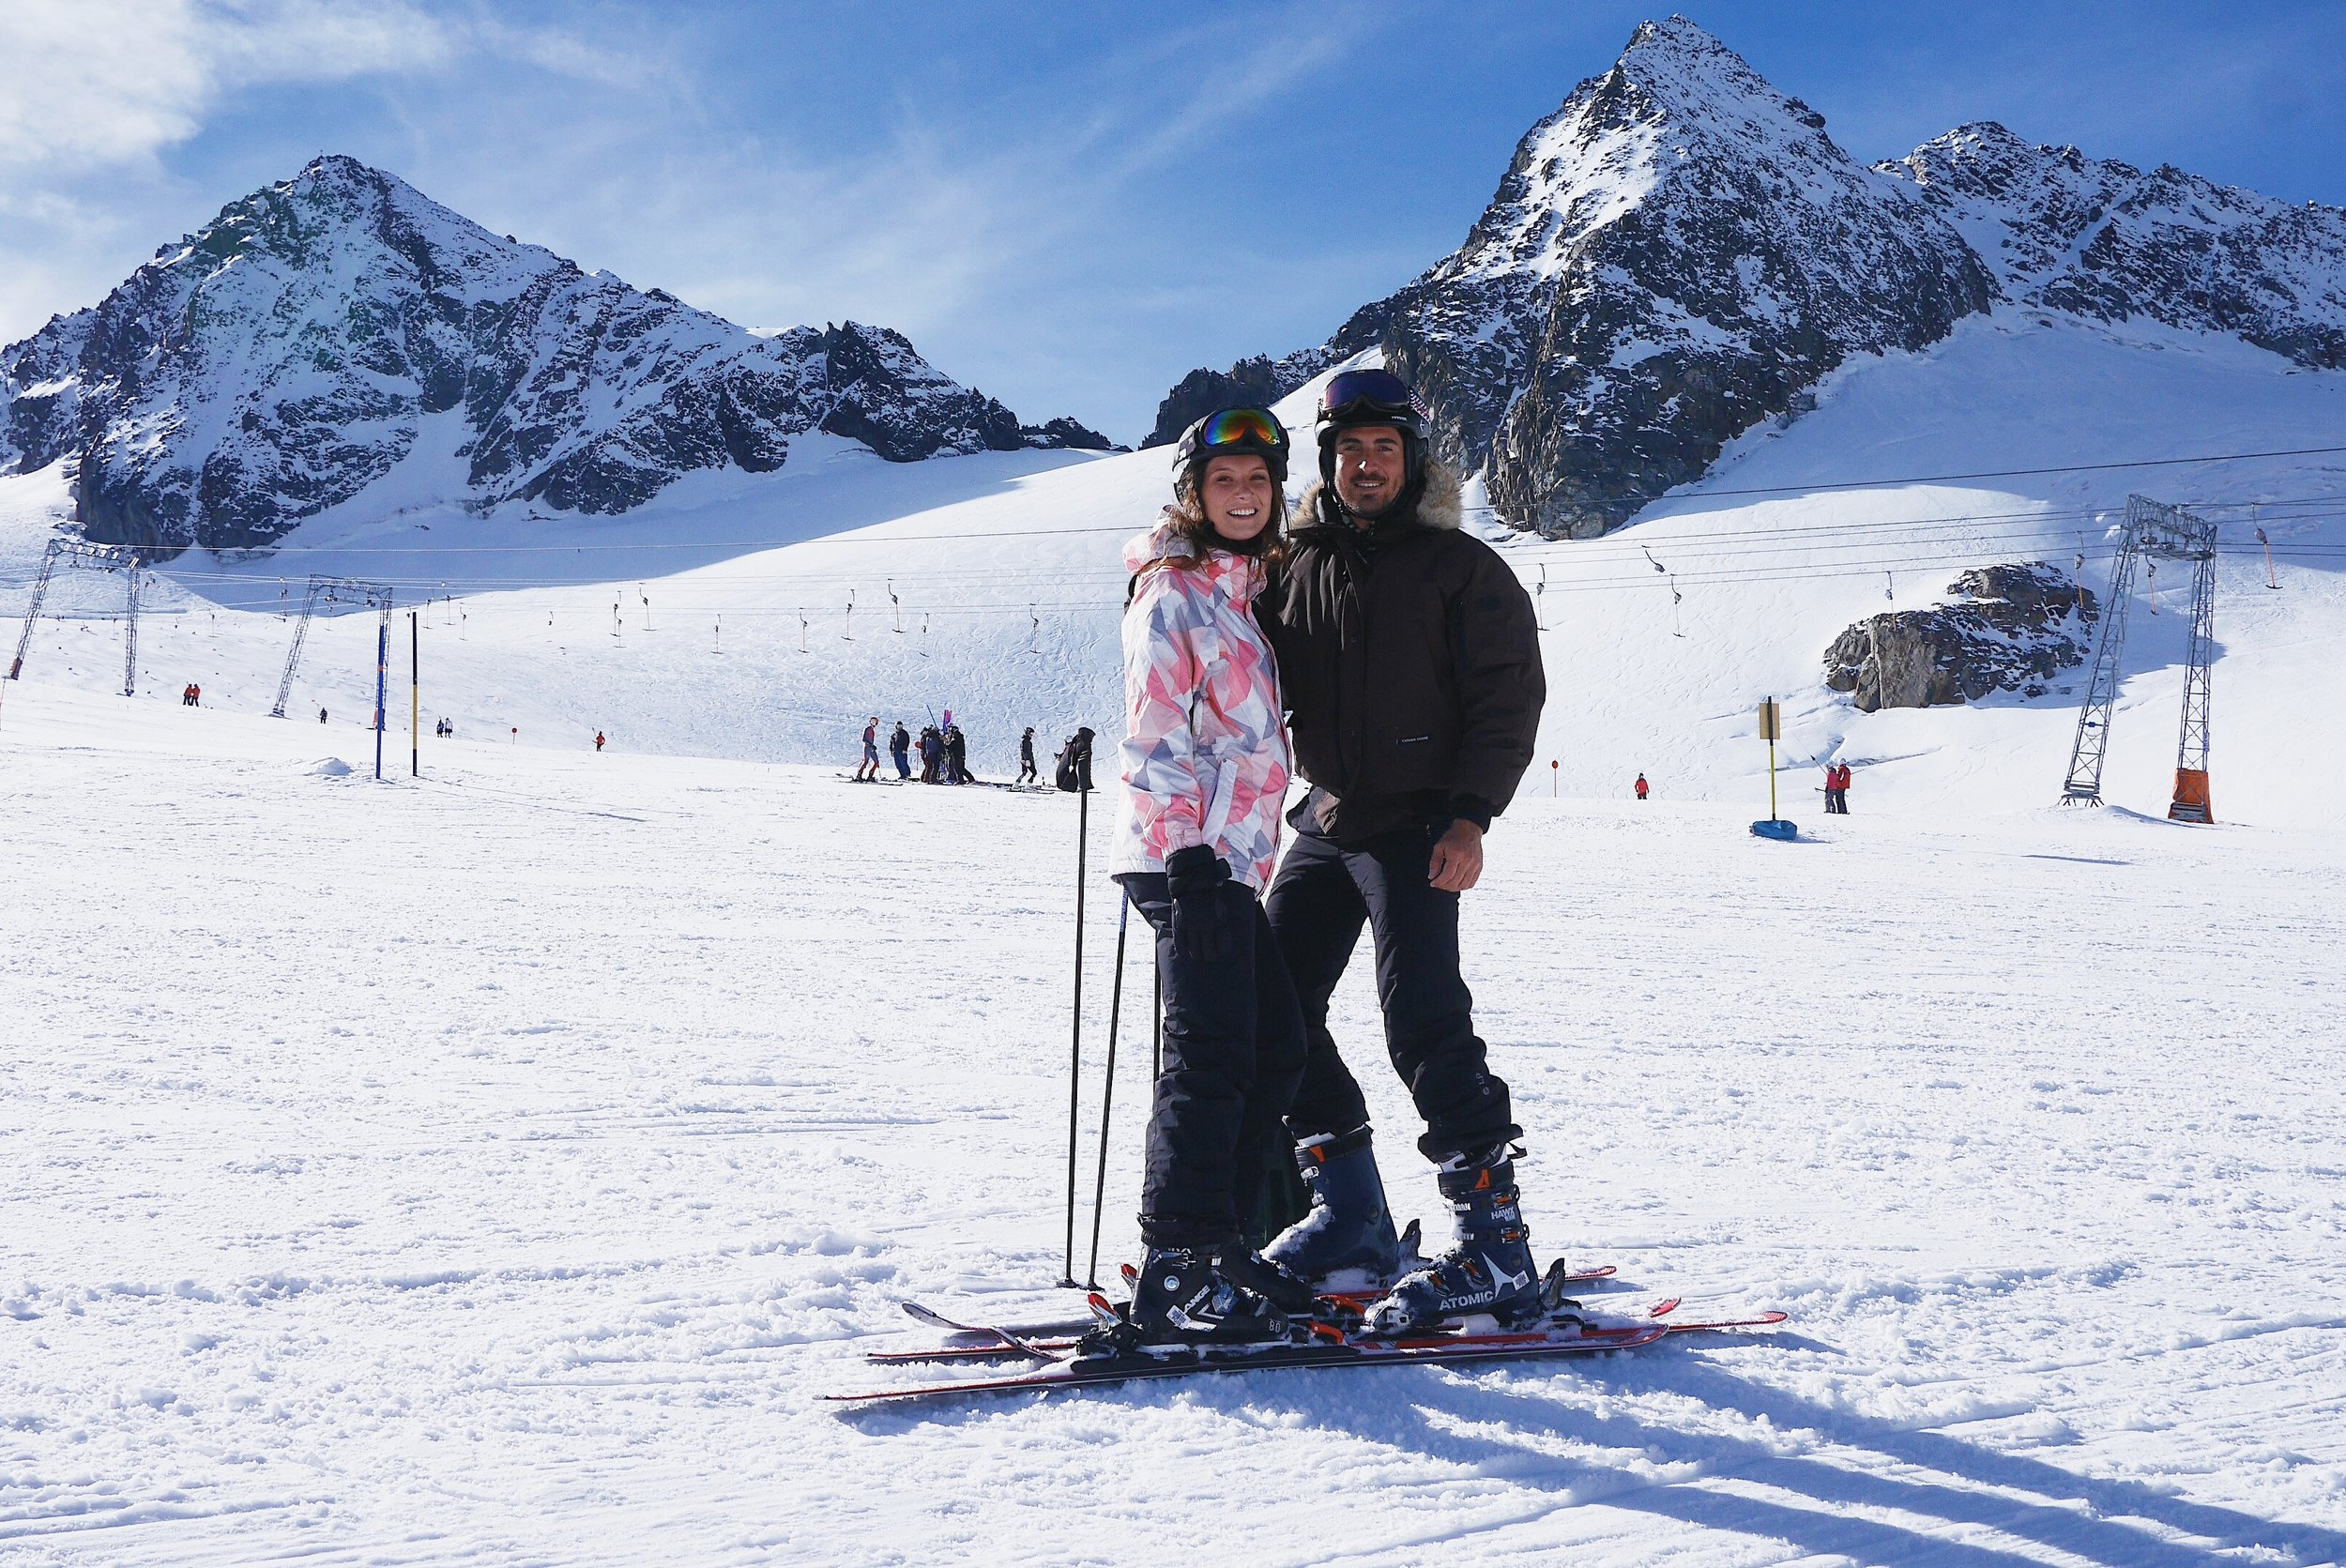 ski-stubai-thecheerfulist-autriche.jpg